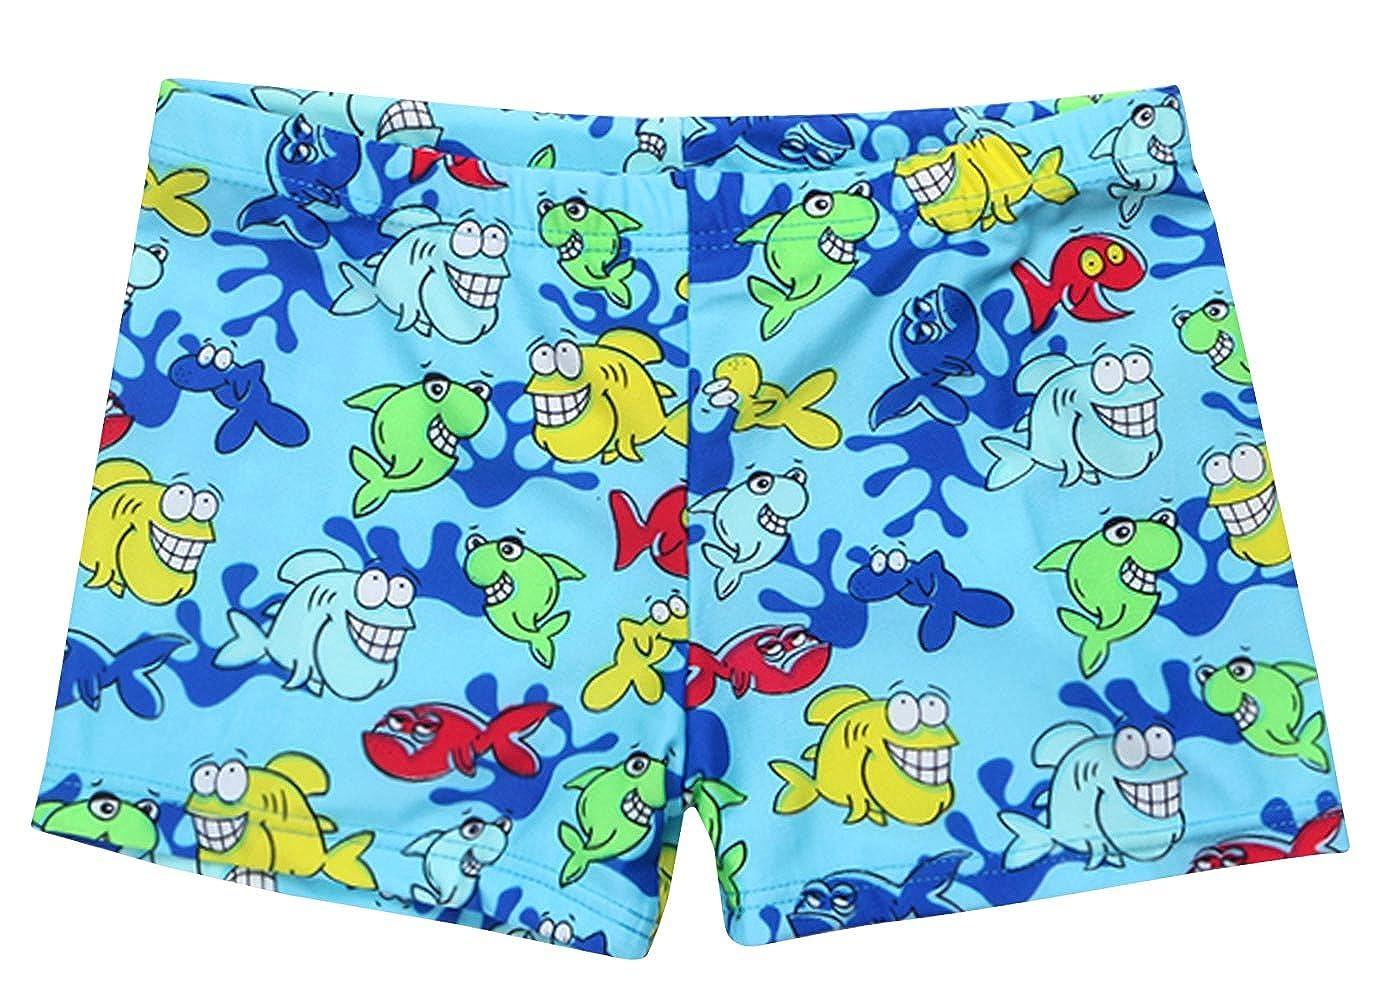 HAINASIDUN Boys Swim Trunks Polyster Quick Dry Swimming Shorts Cartoon Fish Boxer